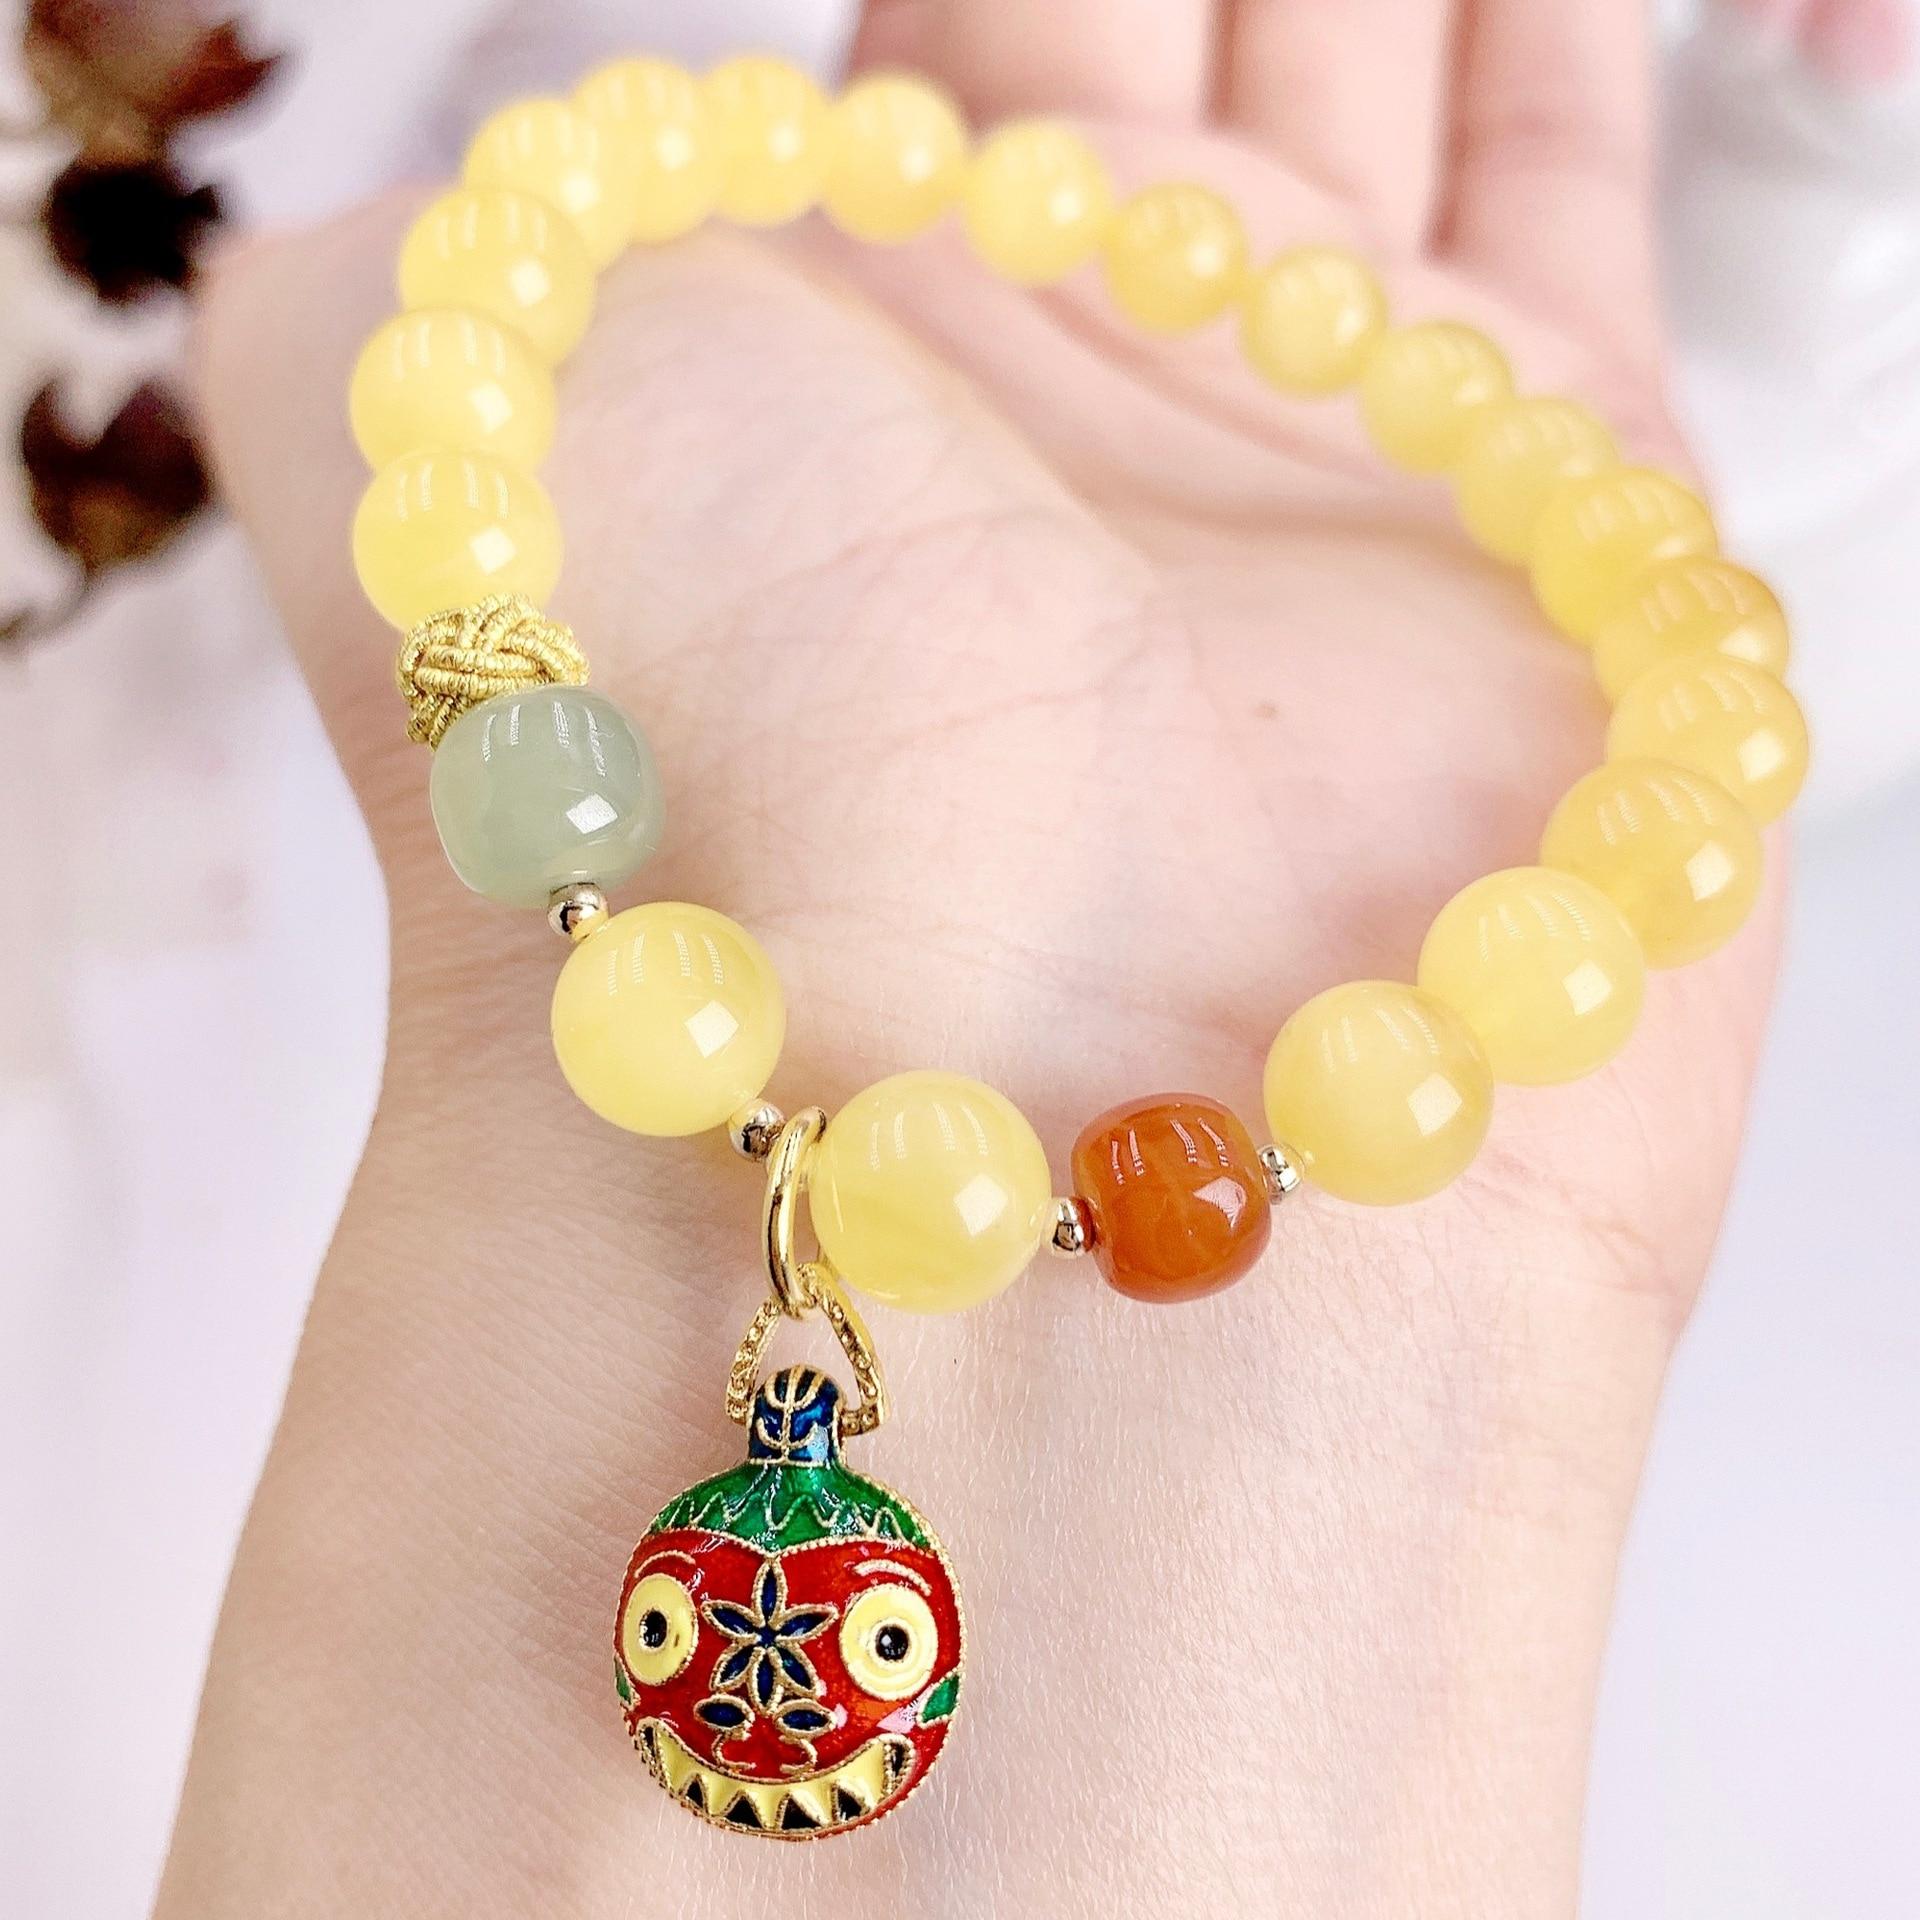 Original design beeswax bracelets for women girlsSouth Red Jasper S925 sterling Silver Golden Swallowing Beast Pendant jewelry